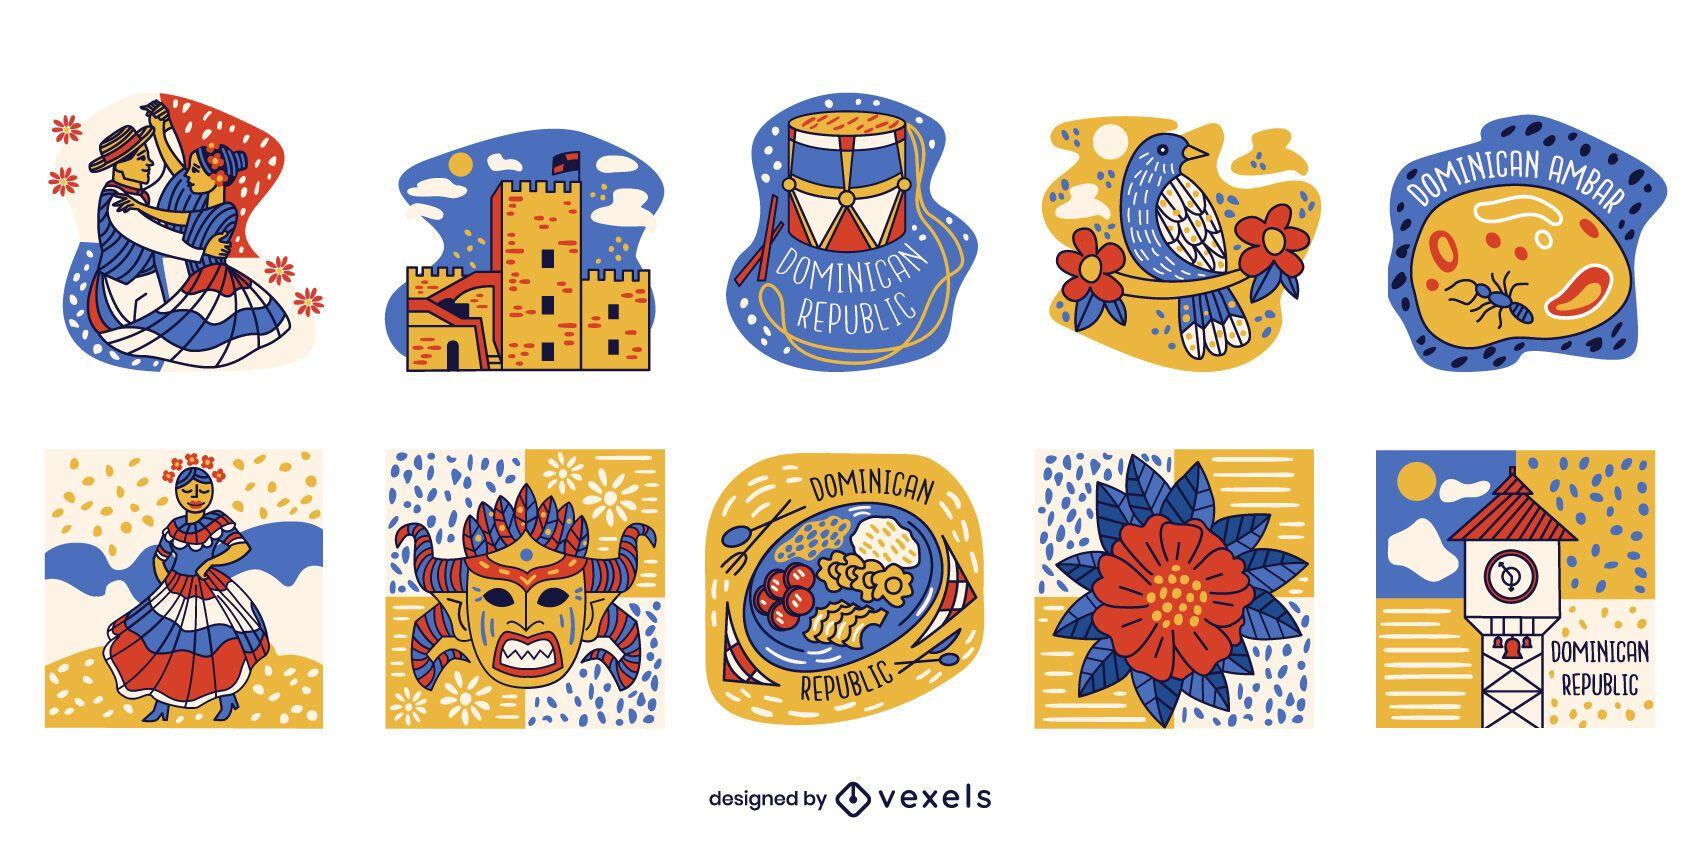 Dominican republic elements color set